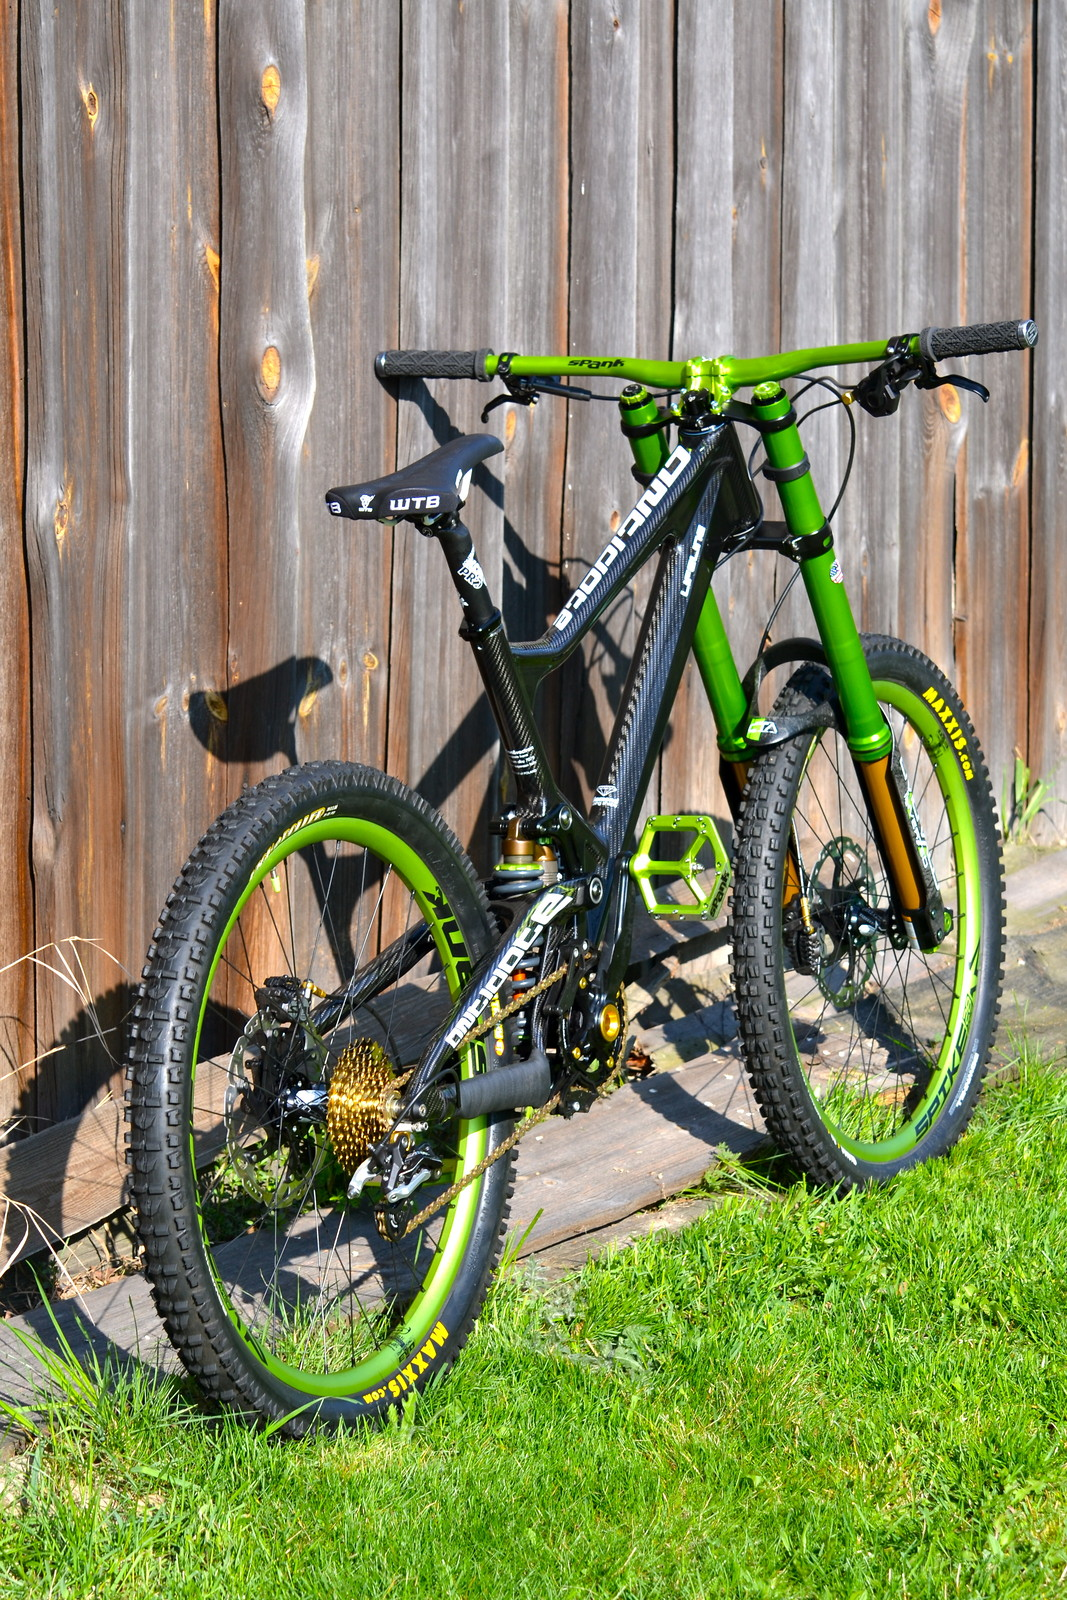 Antidote Dvo Eurodvo S Bike Check Vital Mtb